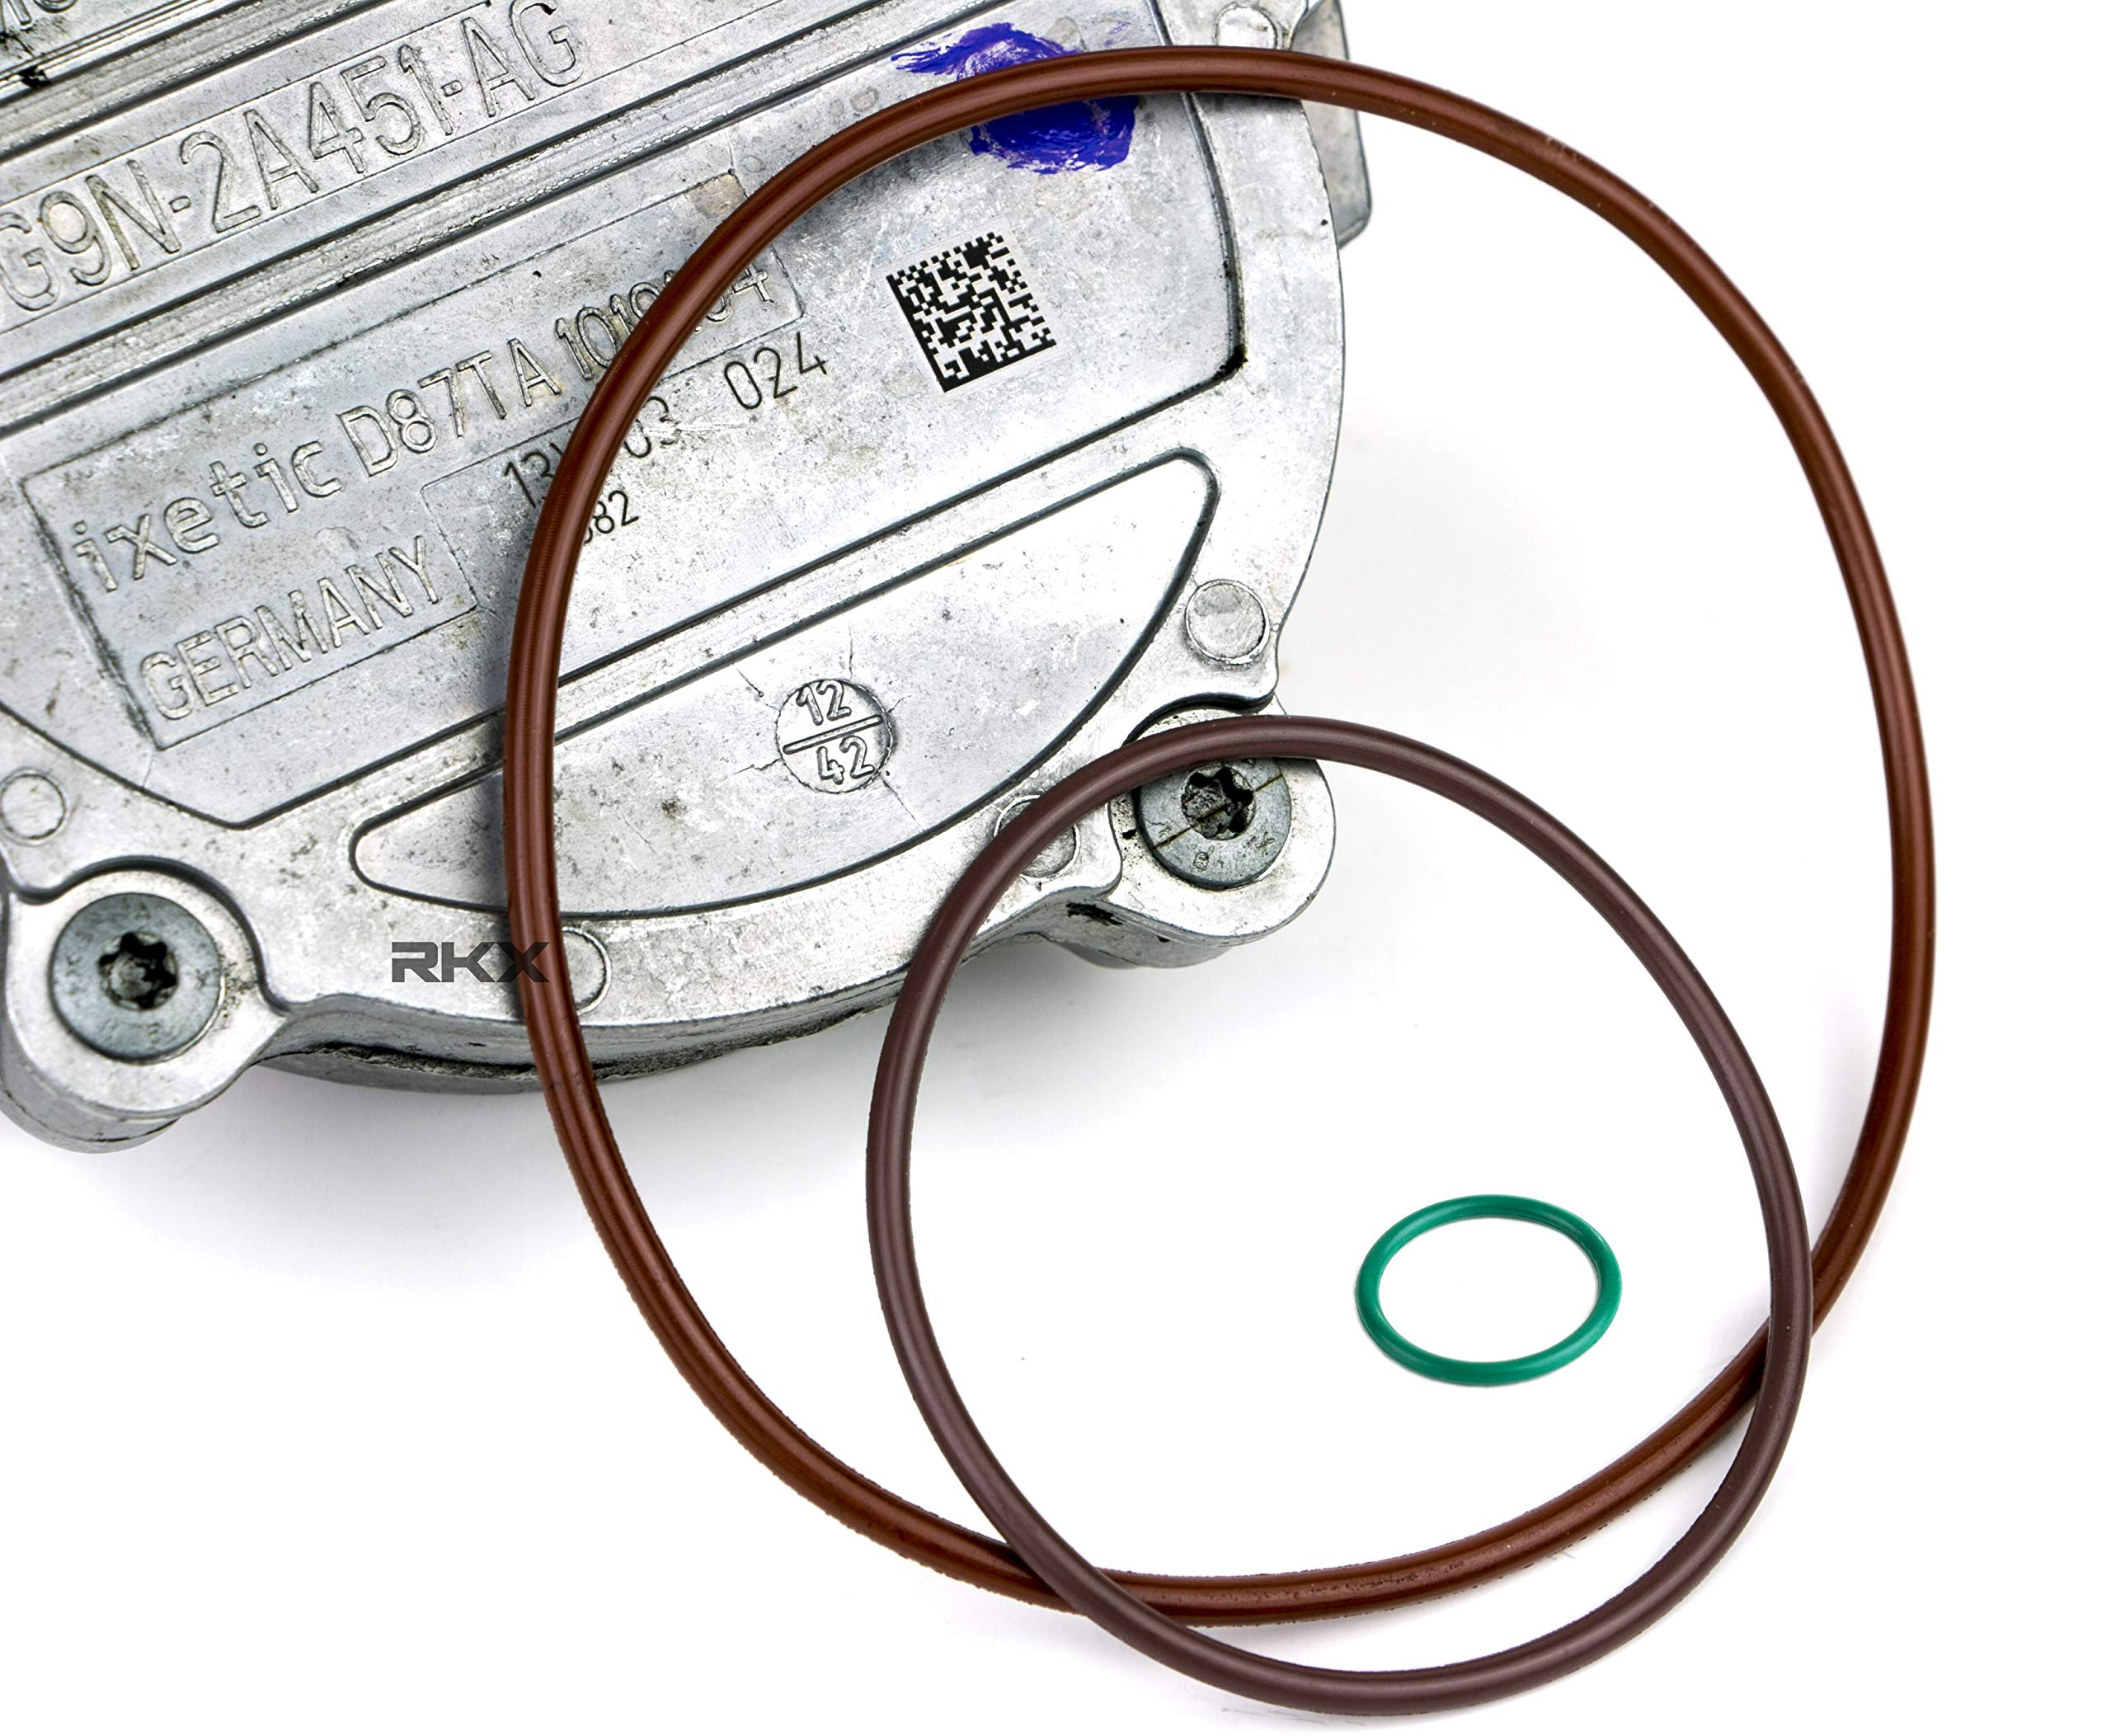 Amazon.com: RKX Vacuum Pump seal kit/rebuild gasket compatible with Volvo &  Land Rover T6 3.2l LR2: Automotive | Volvo Vacuum Pump Wiring |  | Amazon.com